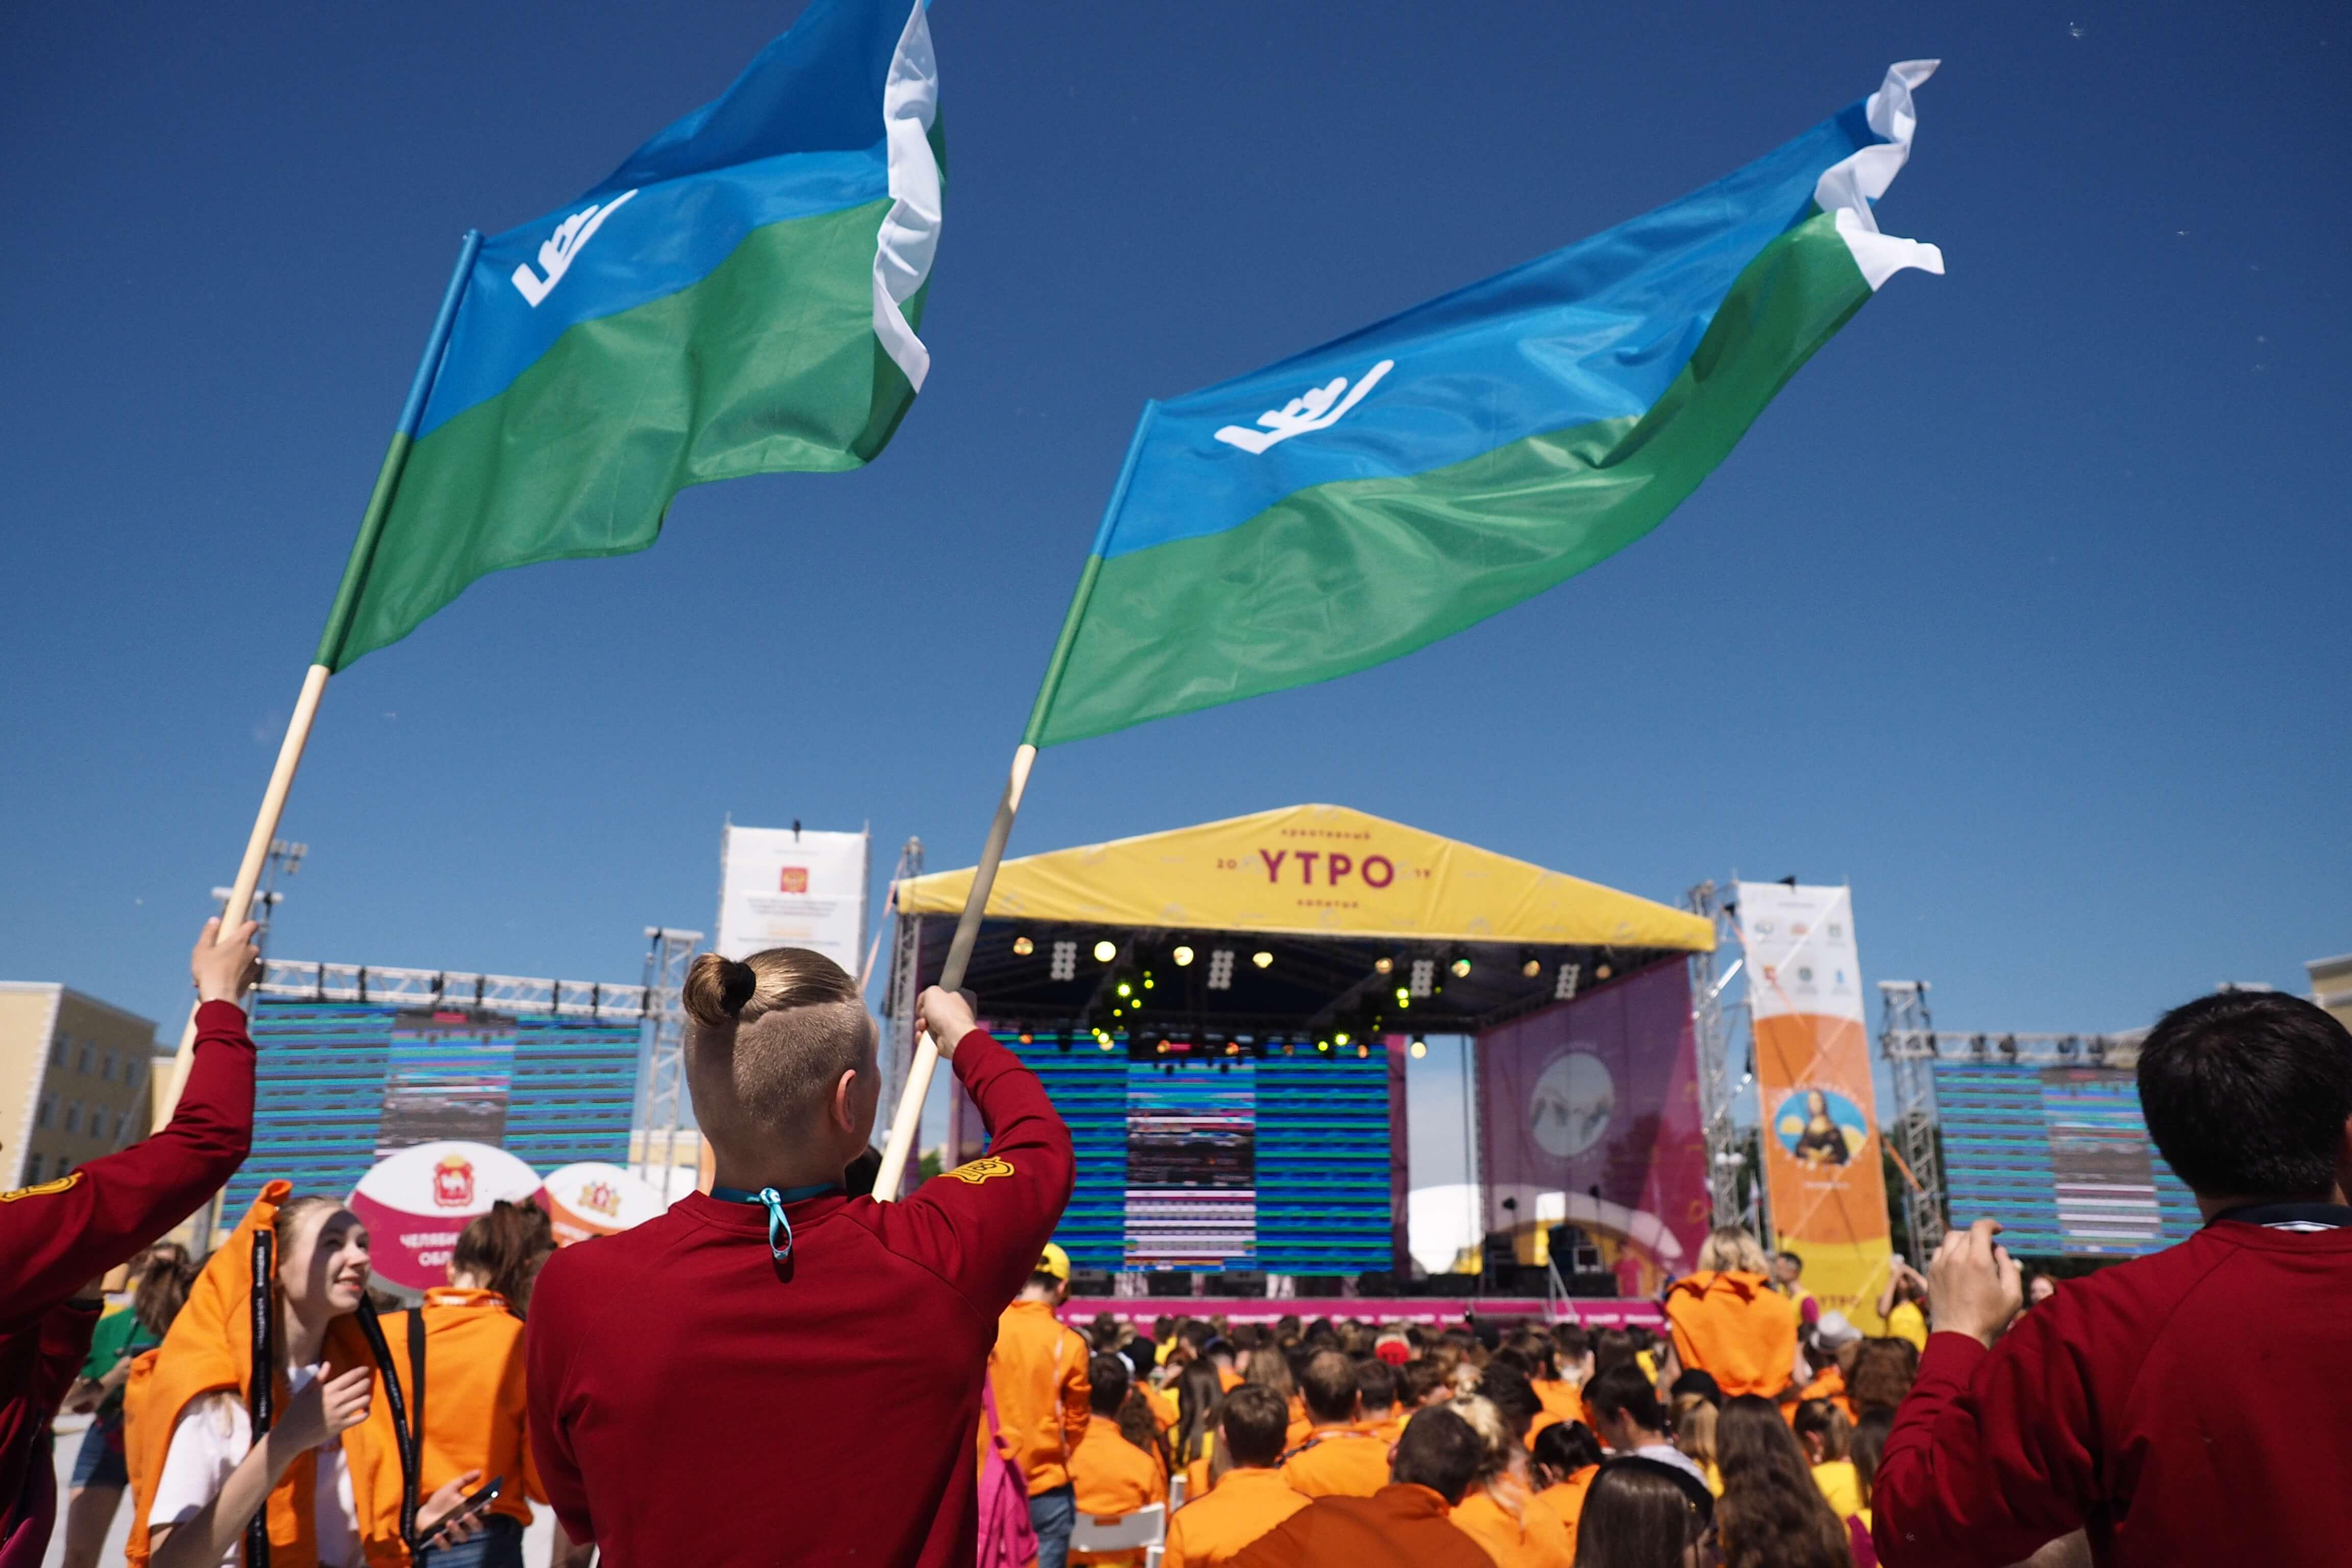 Форум «УТРО» в Тюмени стартовал!